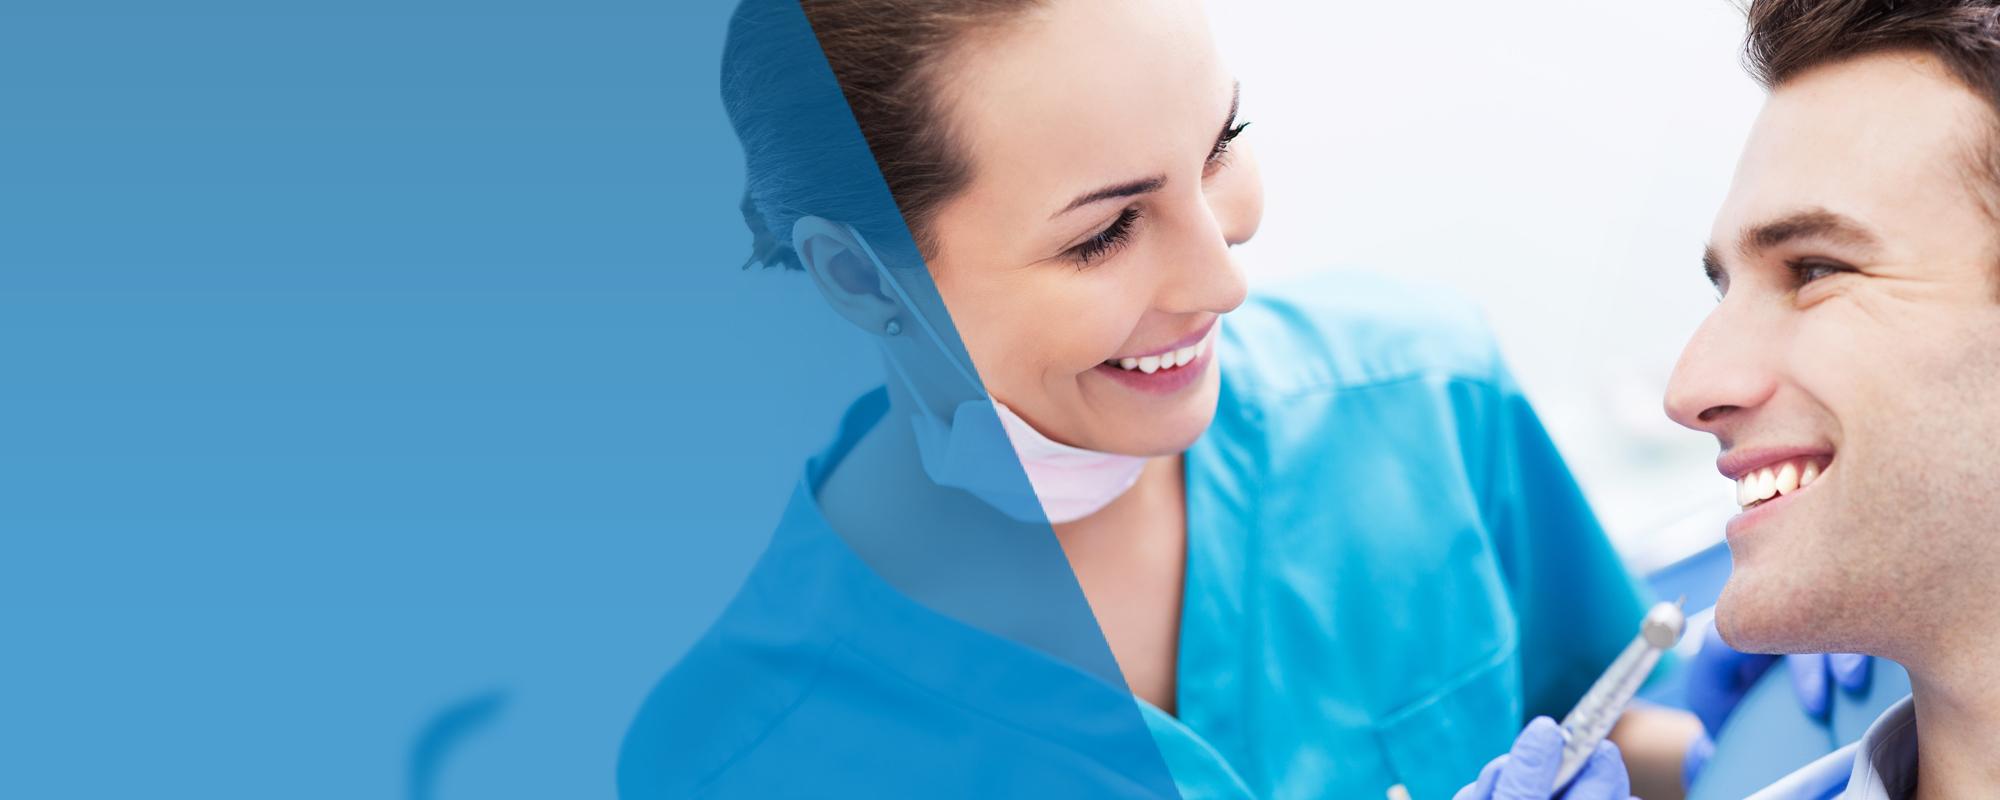 palencia-dental-dr-stephanie-kinsey-saint-augustine-fl-dentist-banner-03